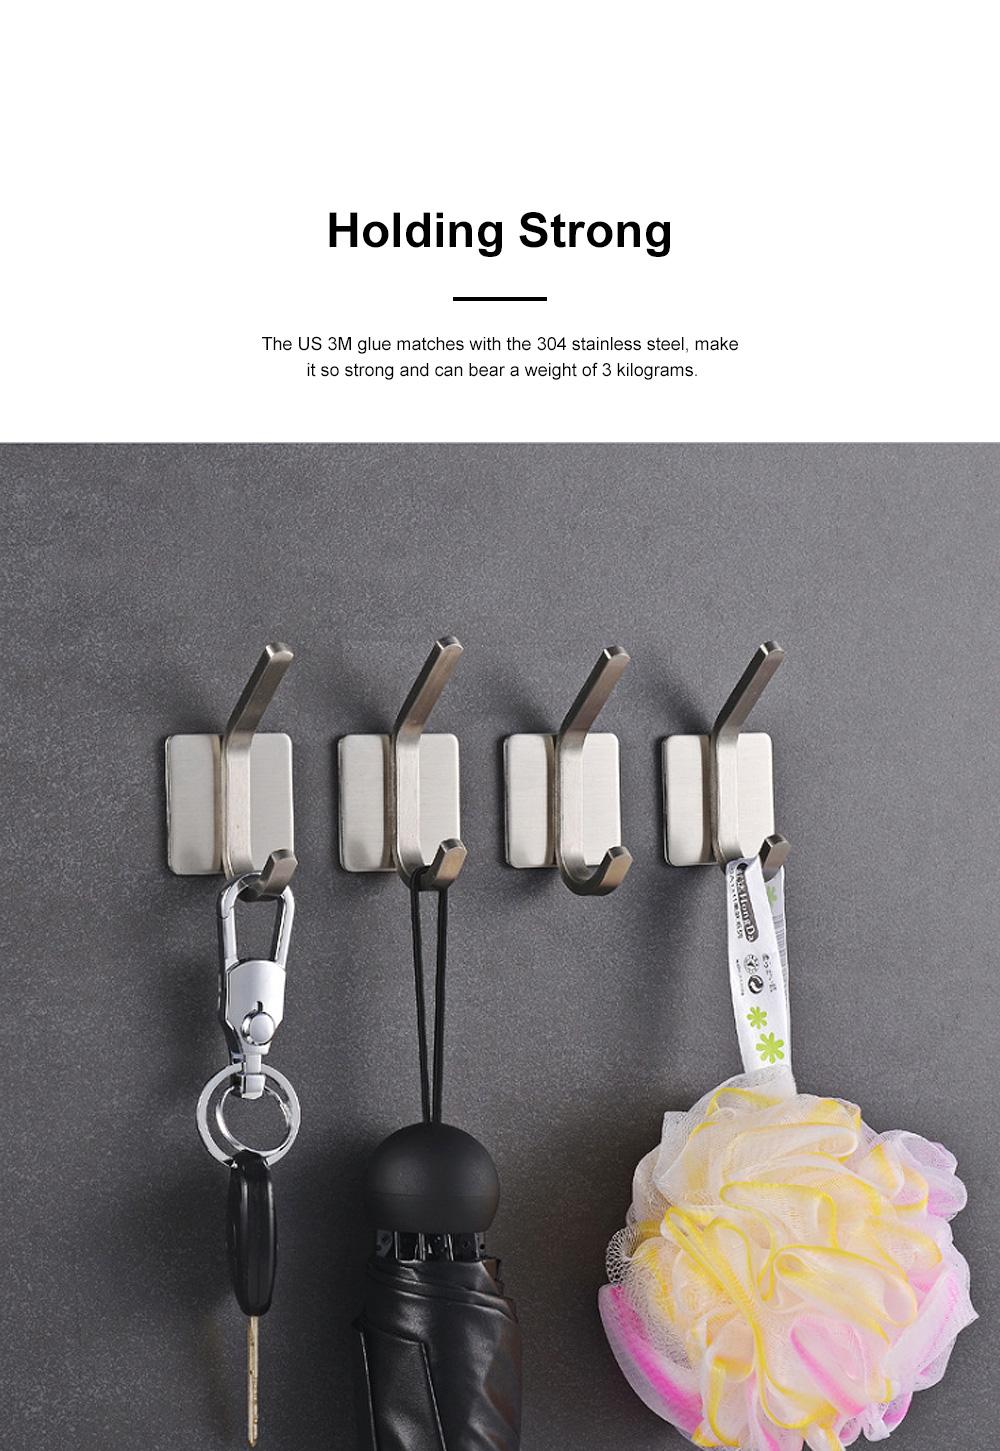 3M Glue Long Tail Hooks for Kitchen Bathroom Bedroom Hanging Waterproof 304 Stainless Steel Wall Hooks 1